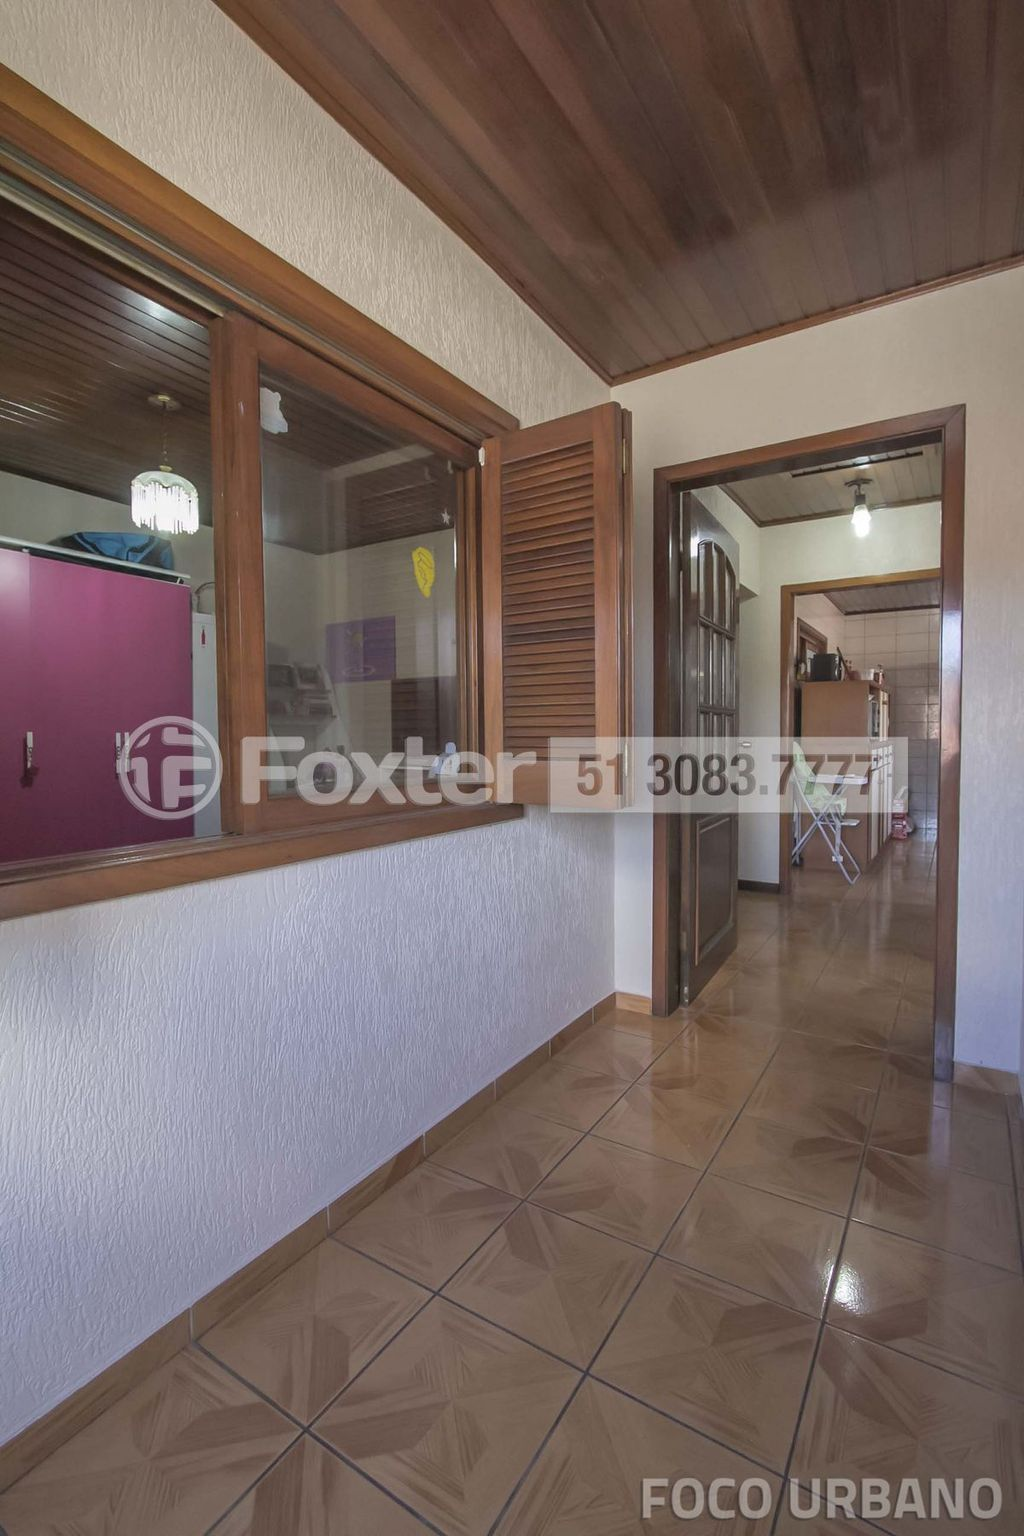 Casa 4 Dorm, Cavalhada, Porto Alegre (116992) - Foto 8